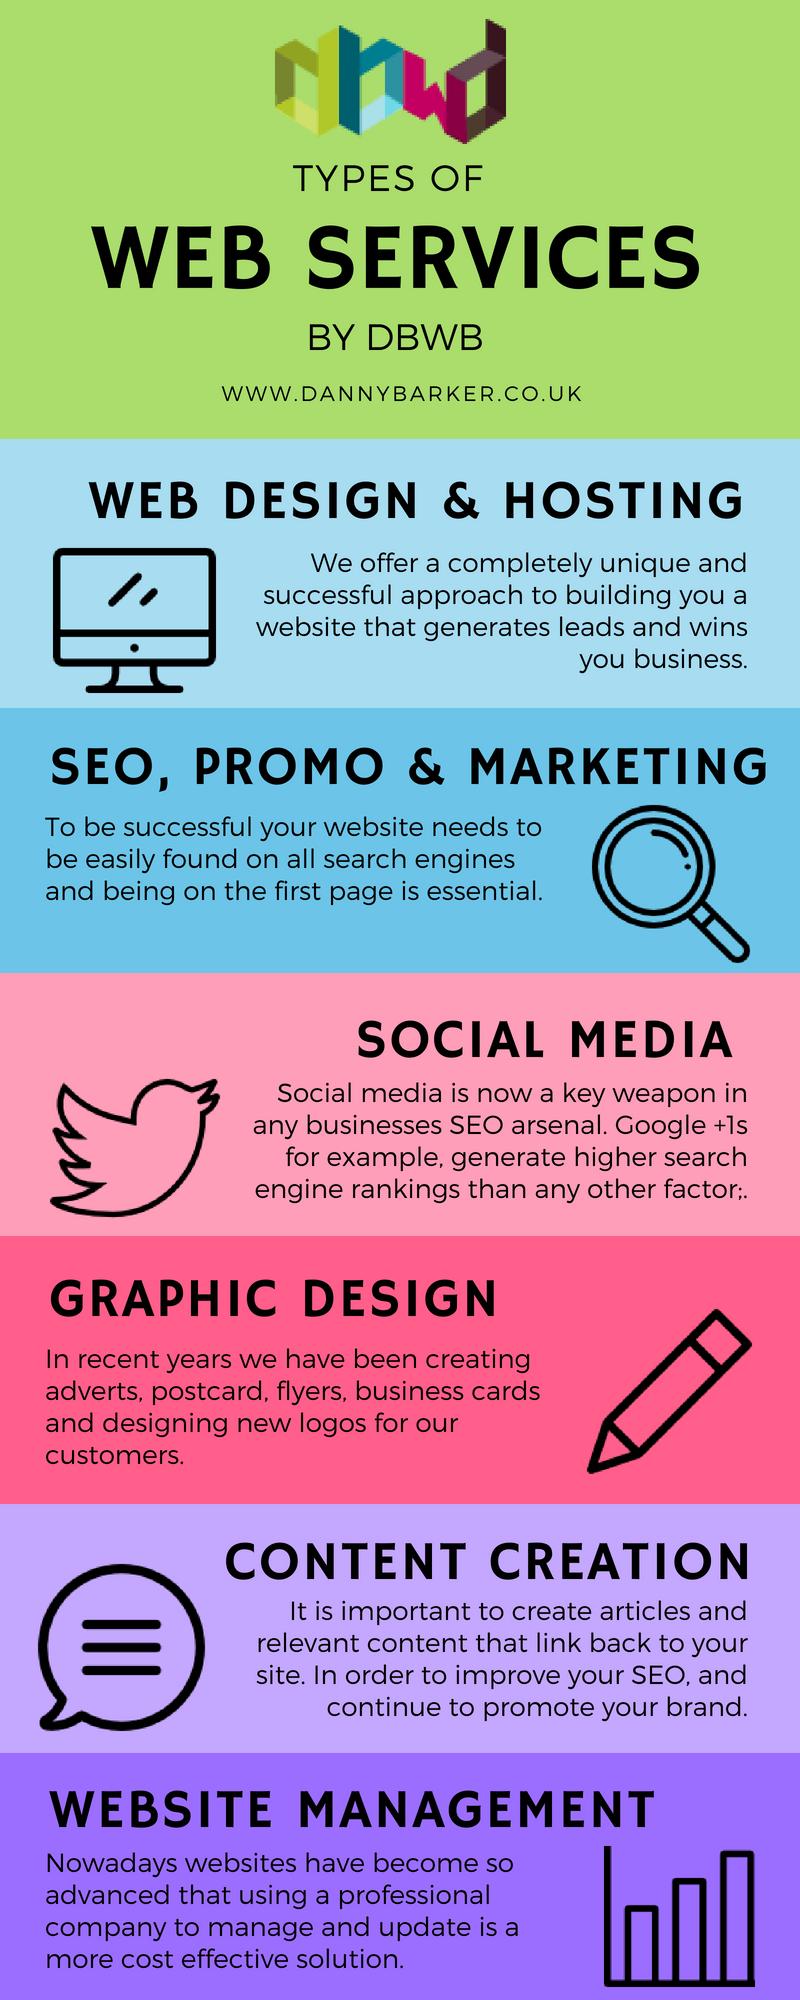 web-services-types-infographic-lkrllc